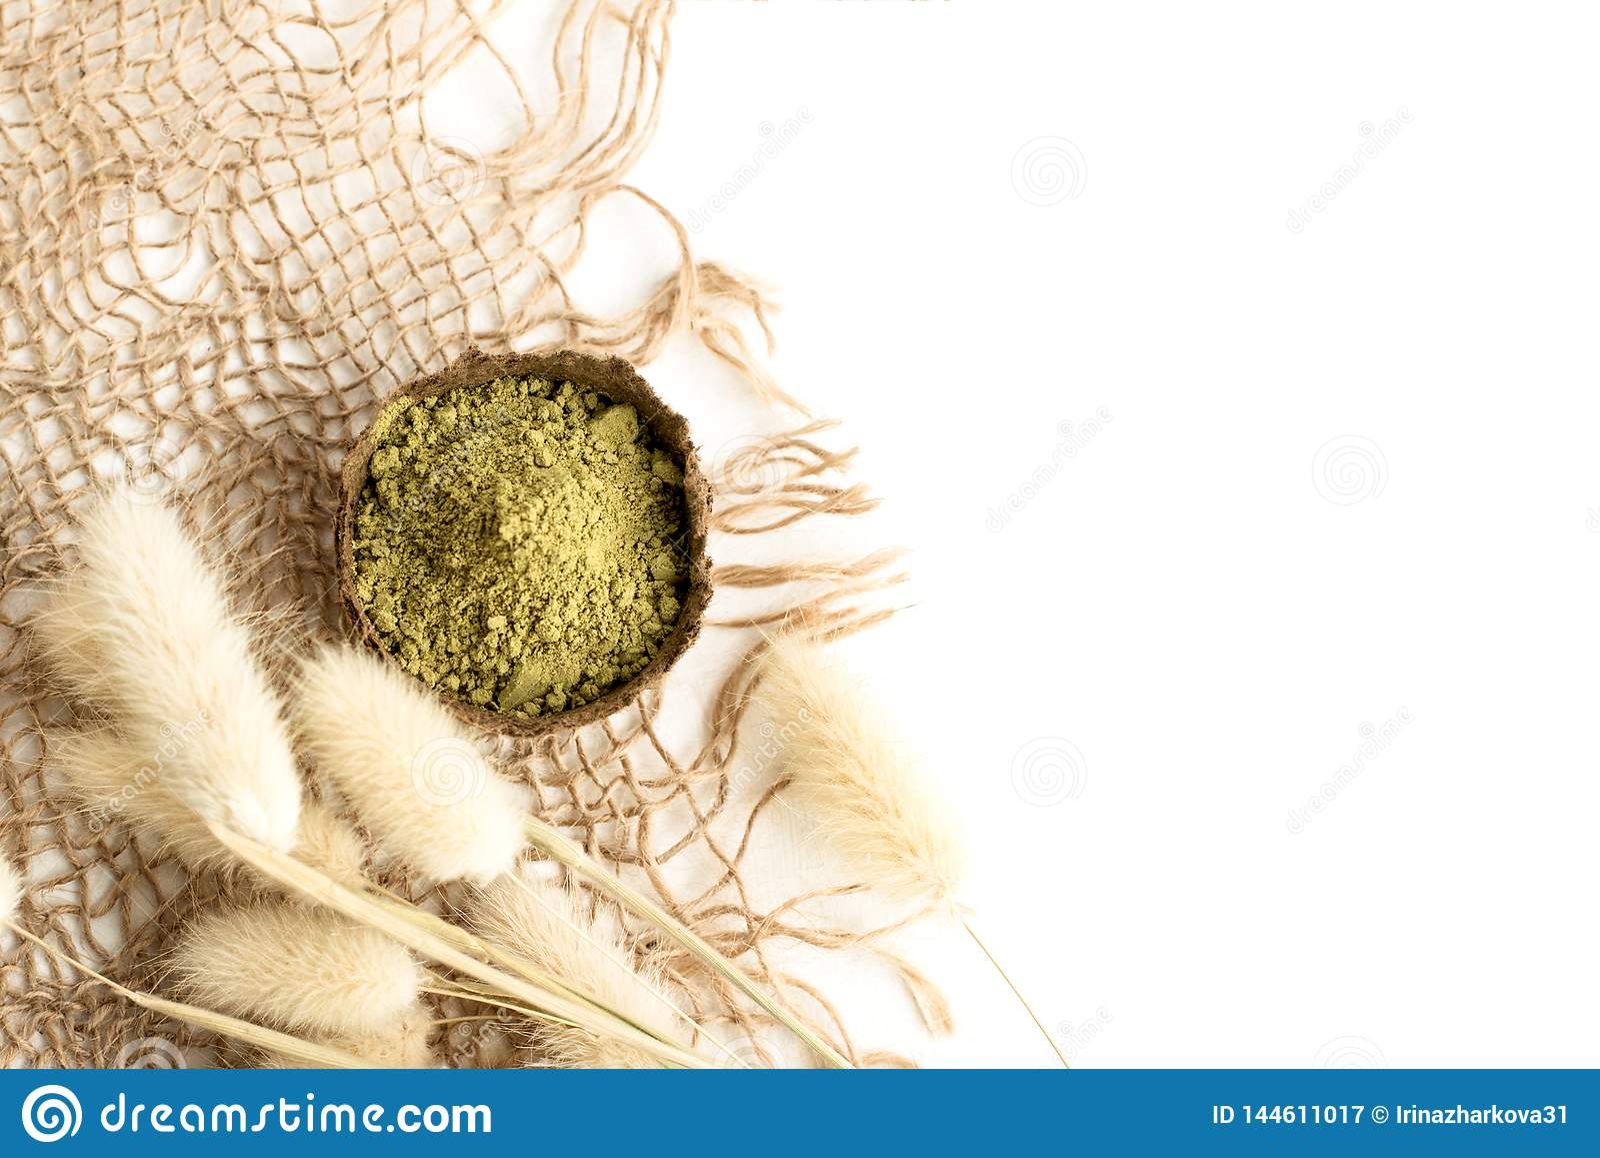 Henna σκόνη για τη βαφή της τρίχας και των φρυδιών και το στρέθιμο της προσοχής του mehendi σε ετοιμότητα, με το πράσινο φύλλο πα